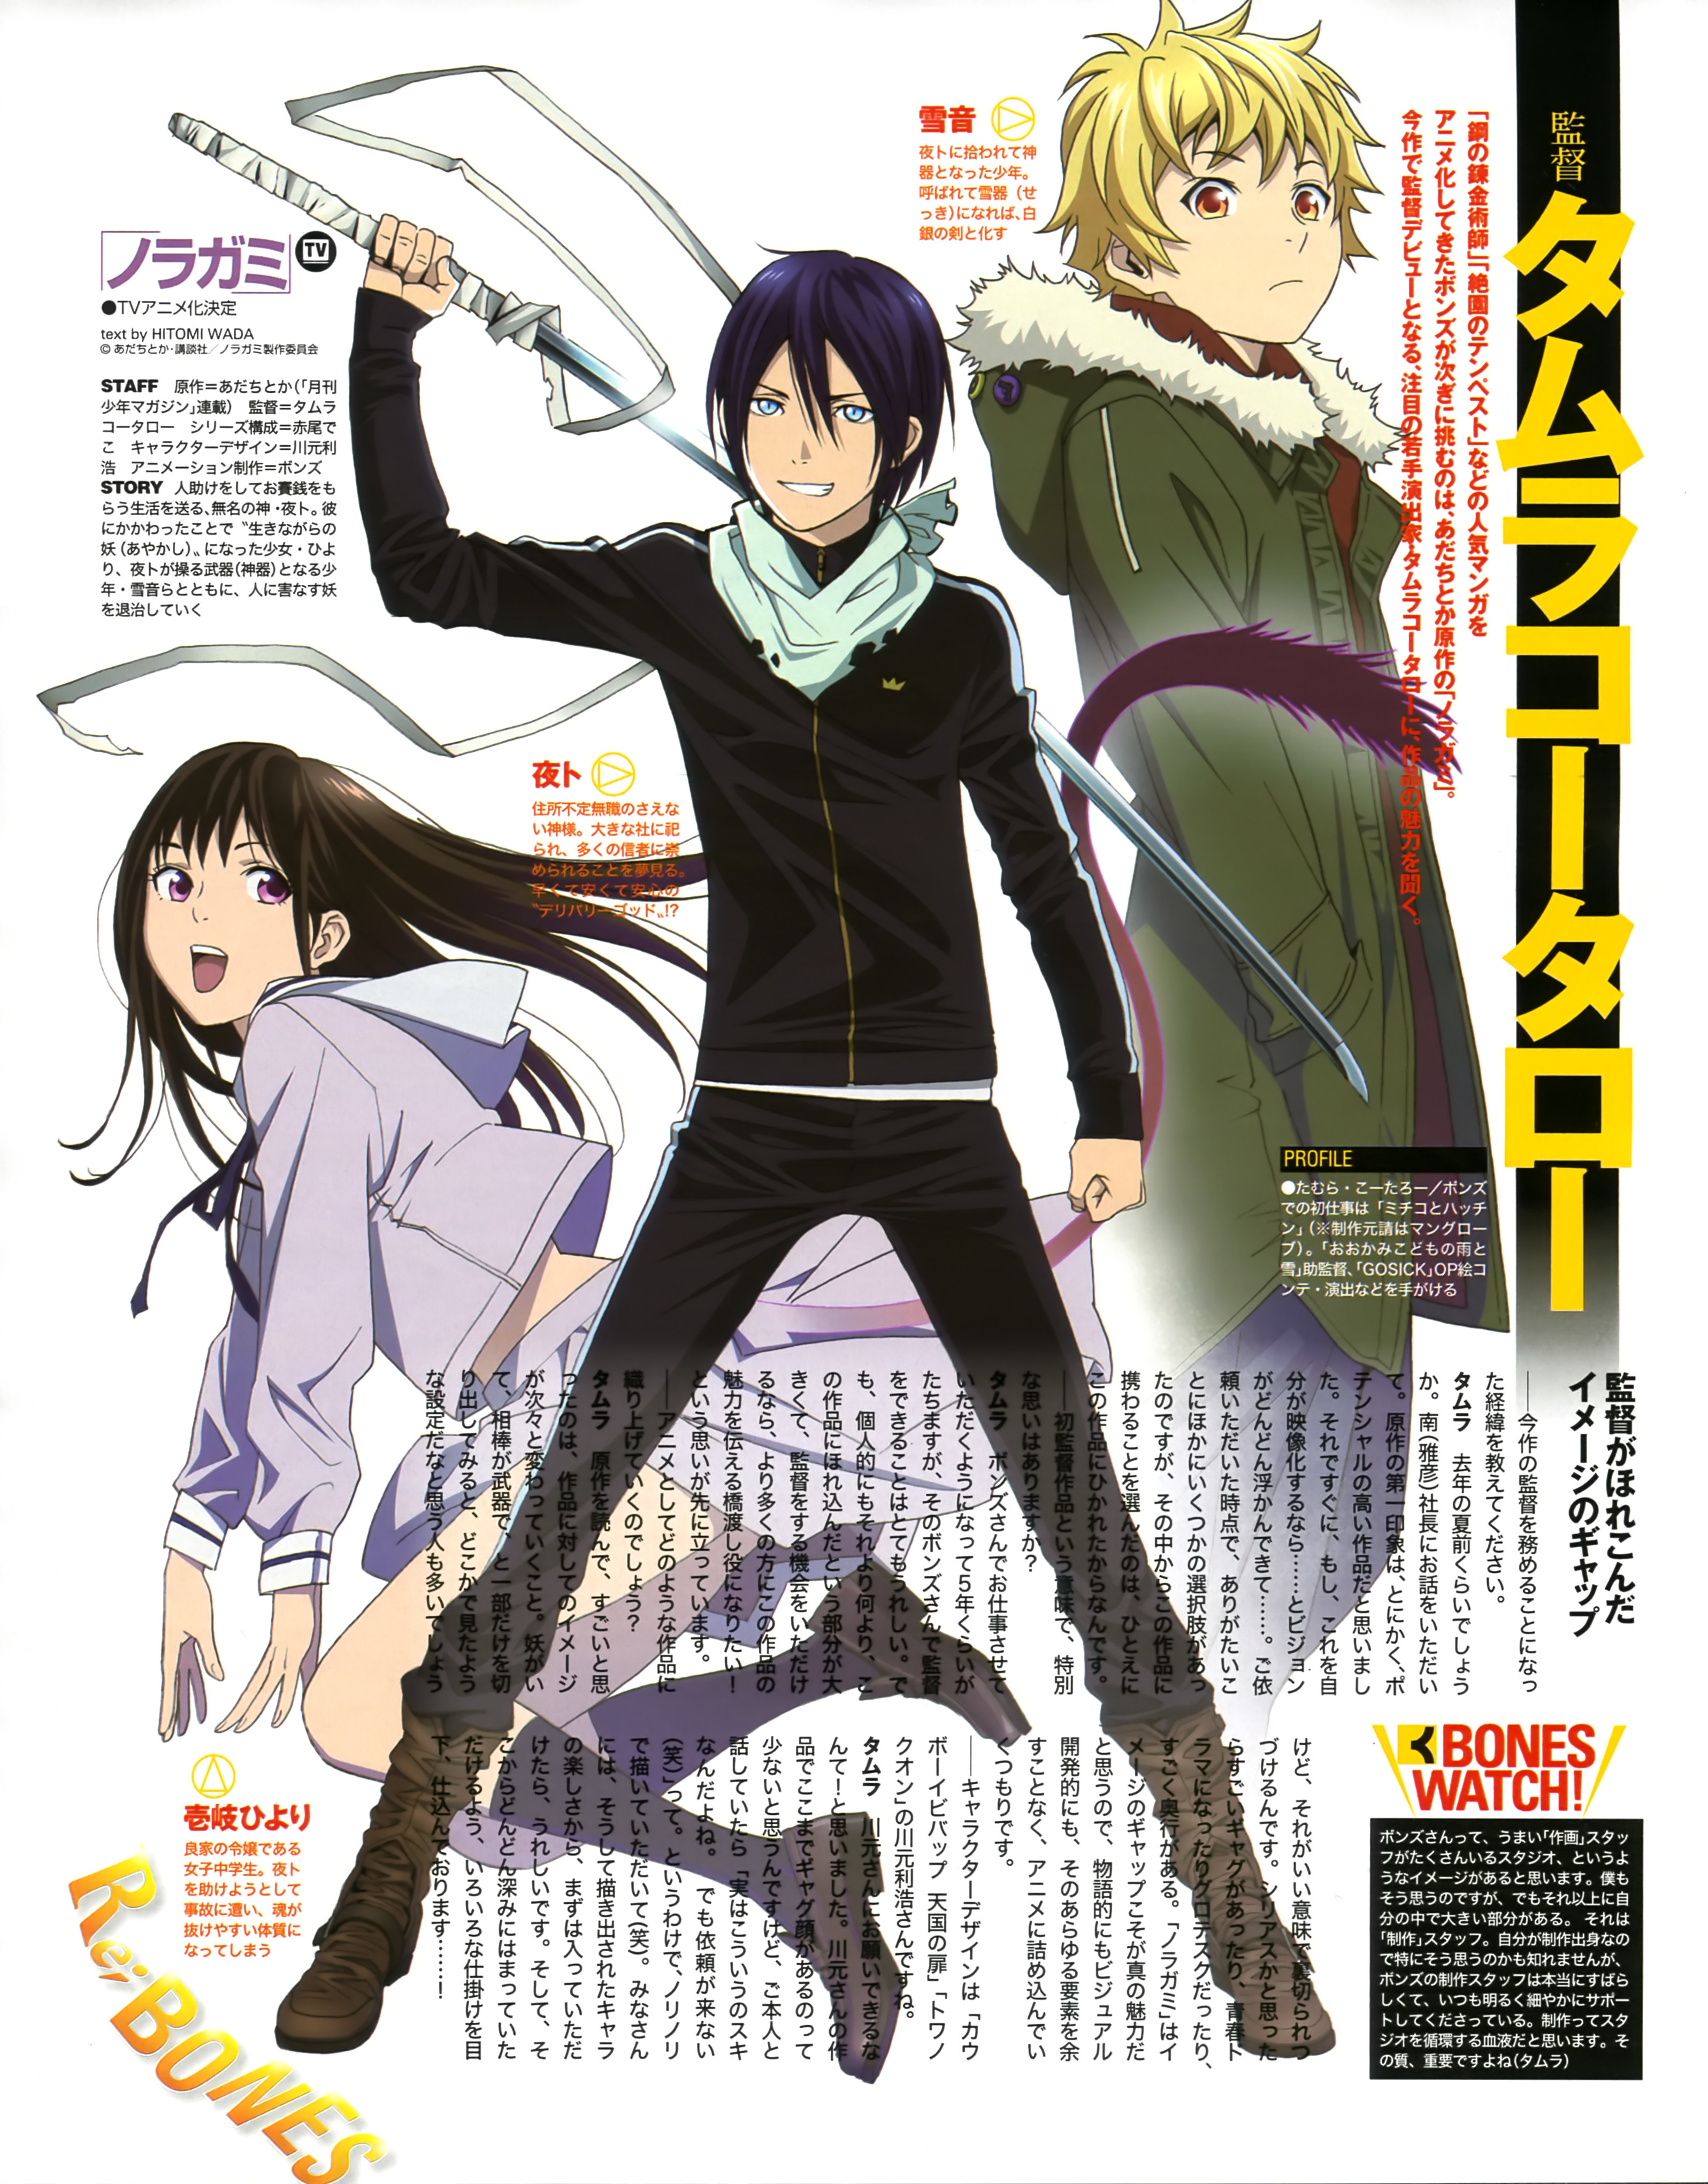 Noragami zerochan anime image board